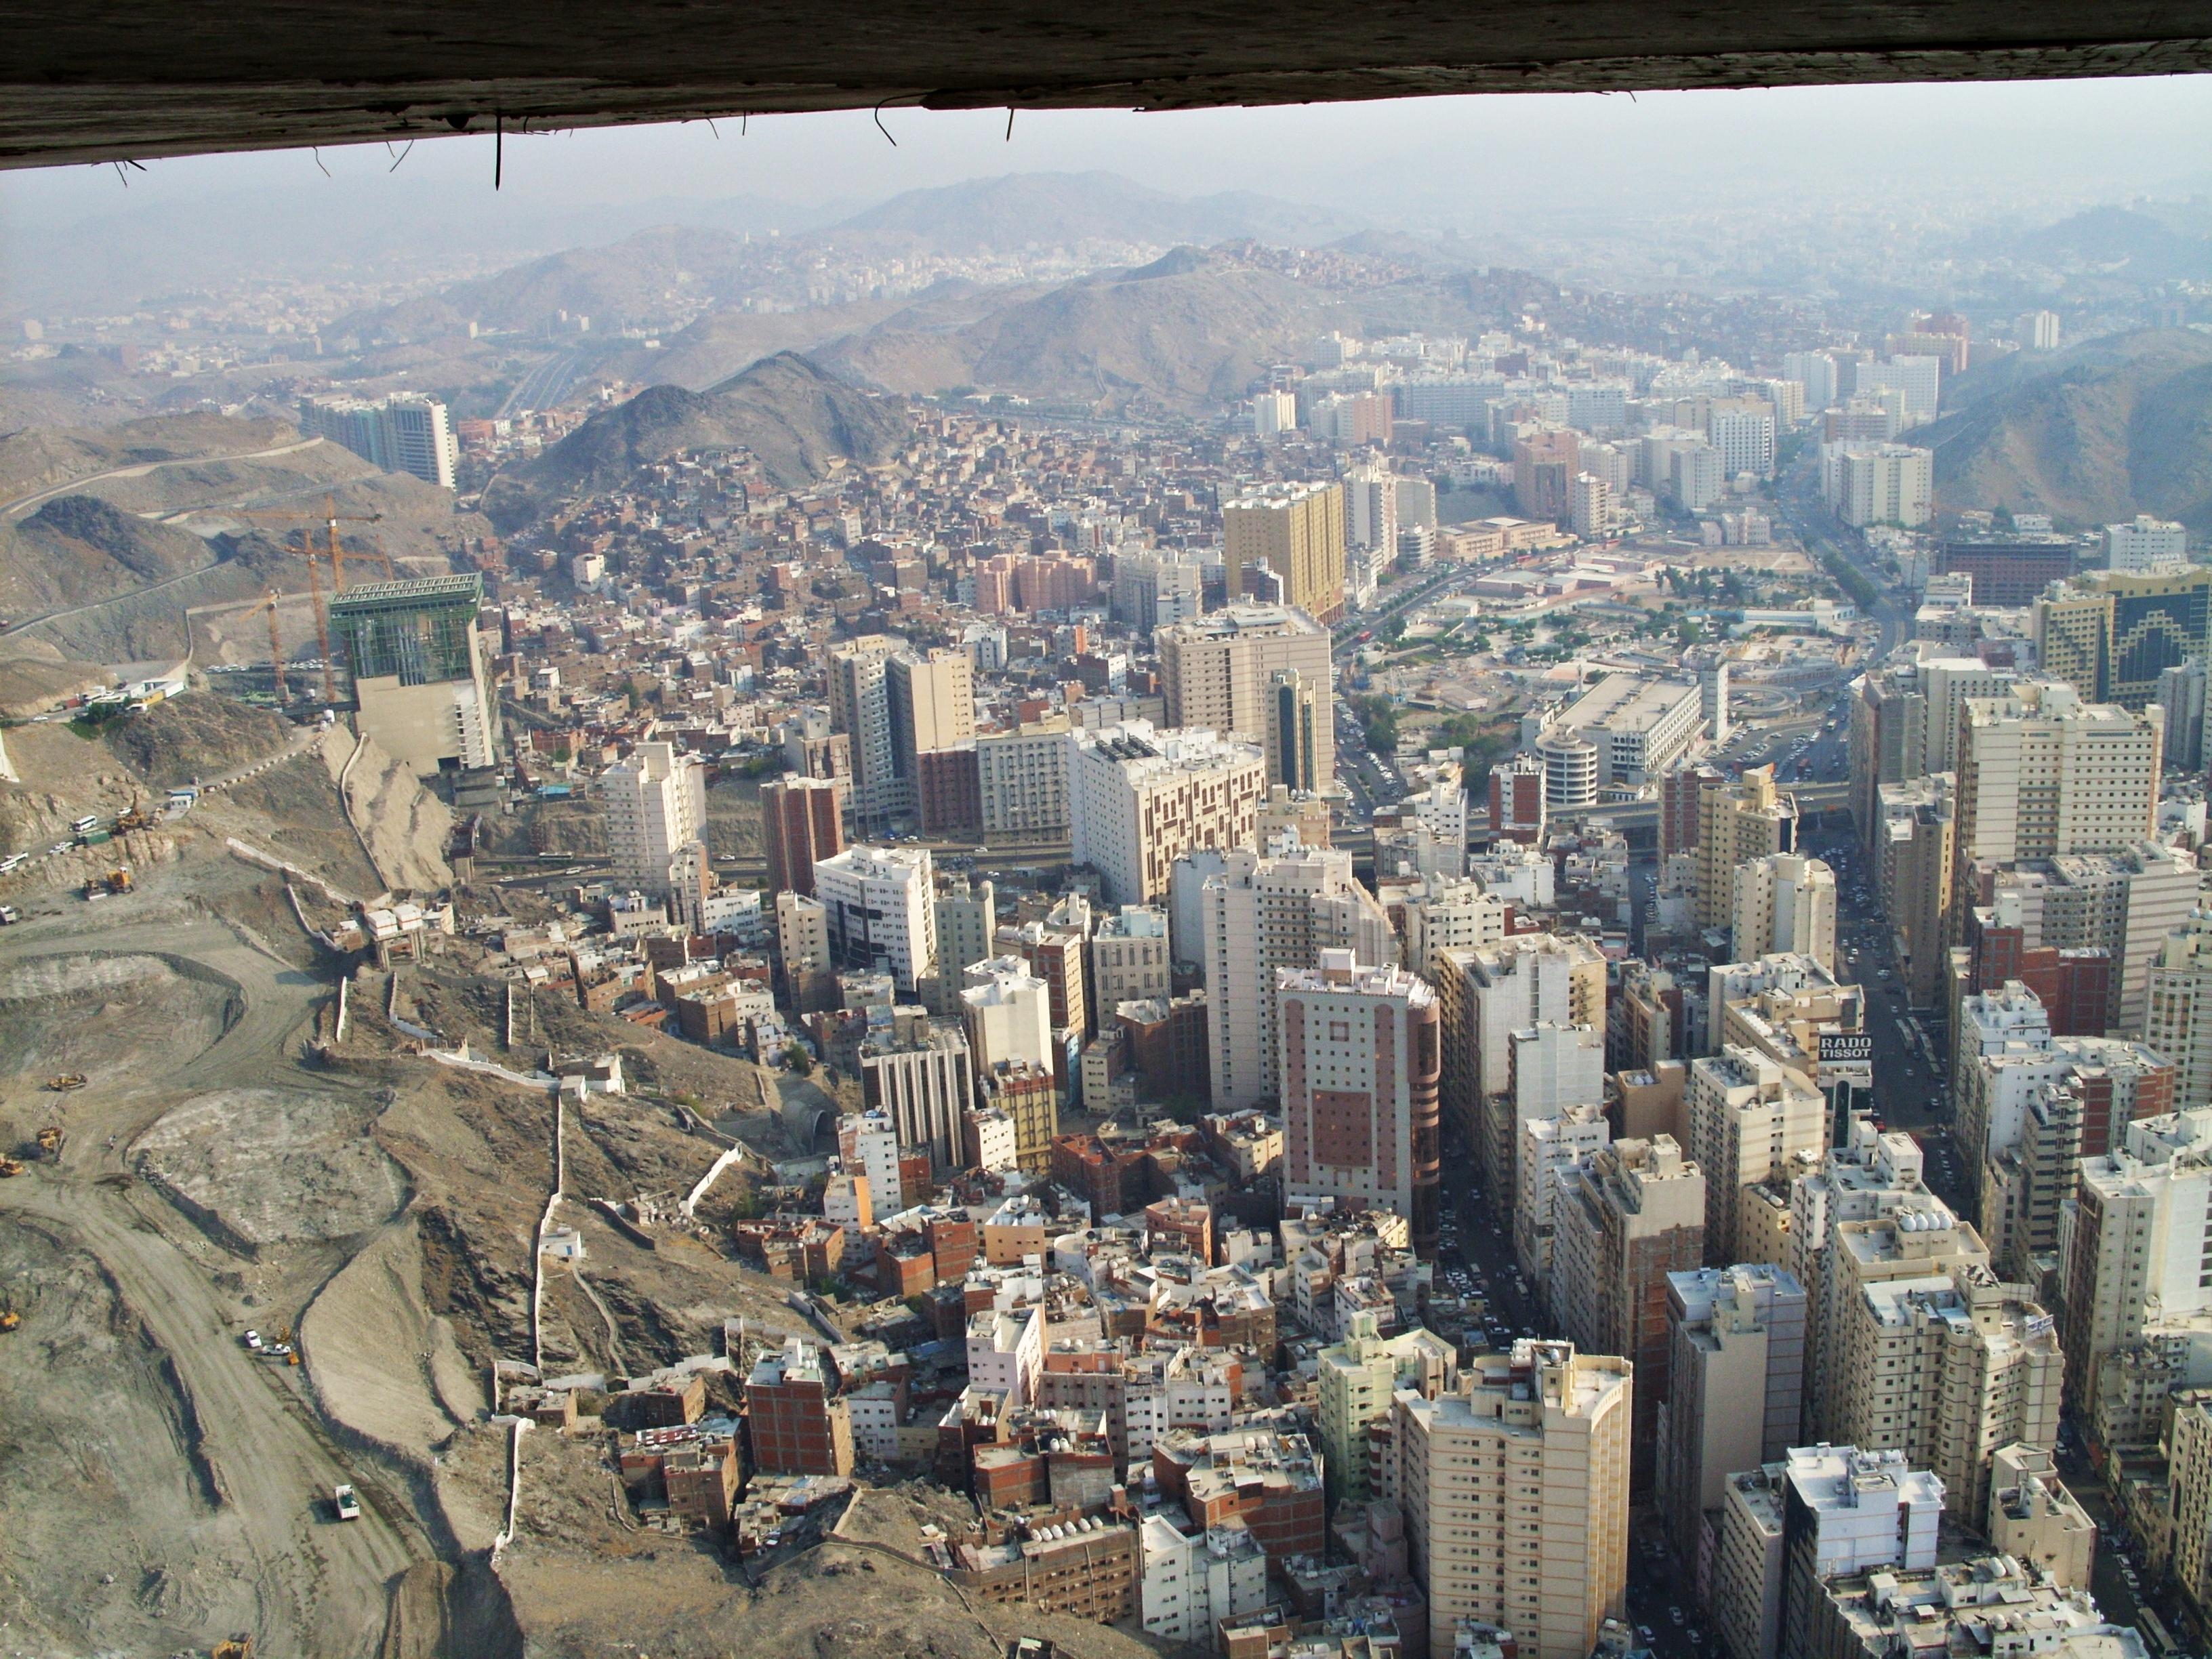 Makkah_(Mecca)_(4) Saudi Arabia